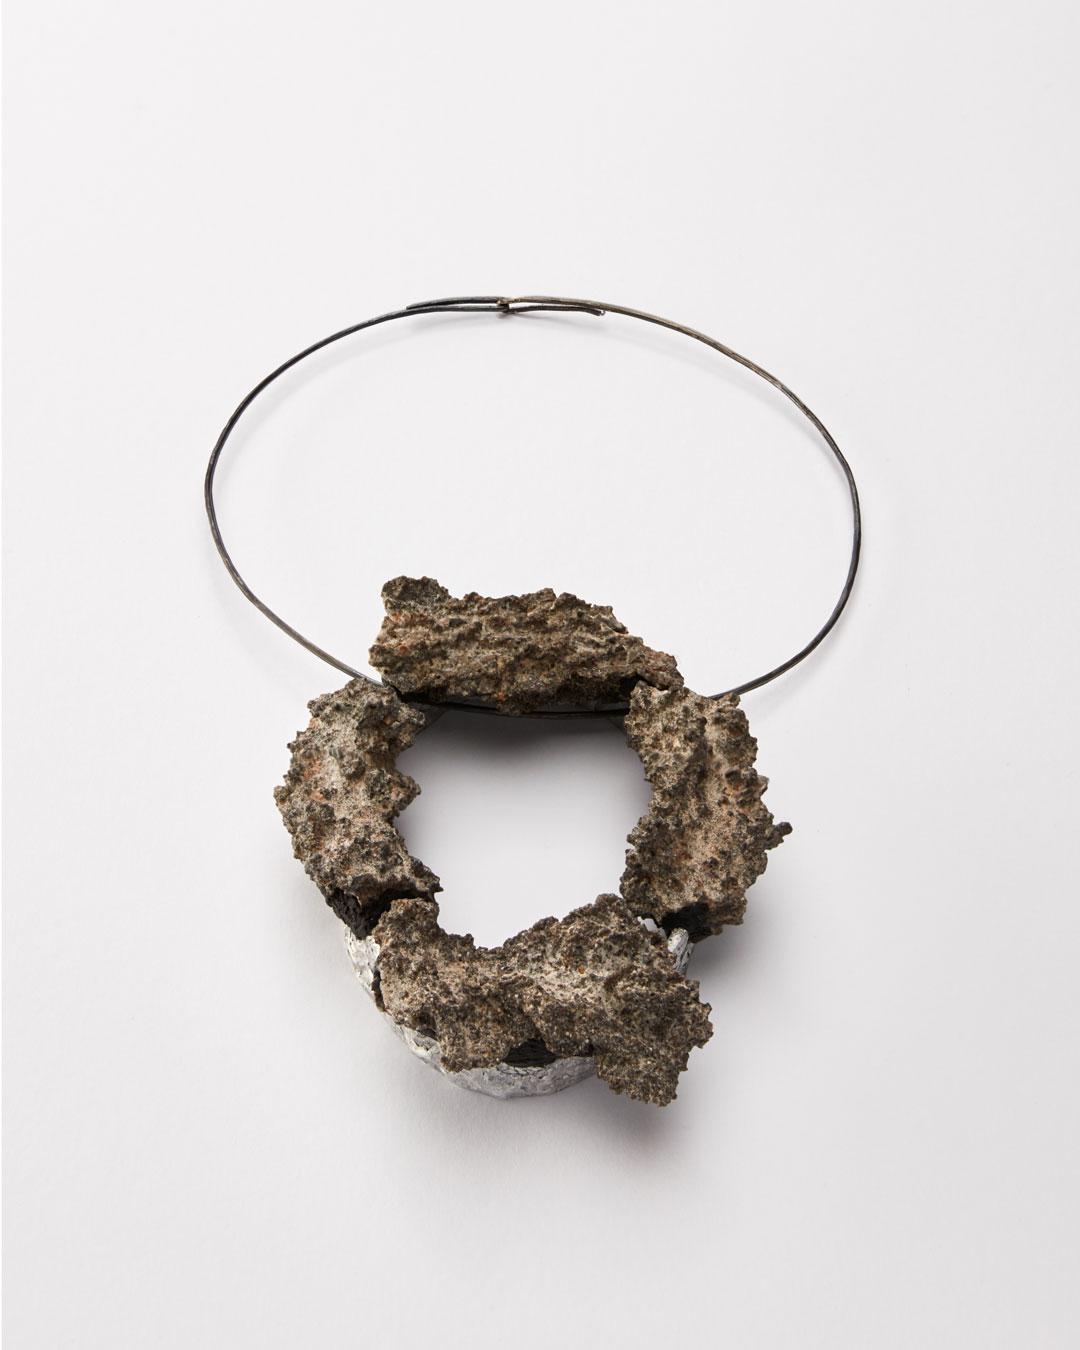 Iris Bodemer, Ordnung 5 (Array 5), 2019, pendant; aluminium, fulgurite, mounting adhesive, 140 x 110  x 35 mm, €3500